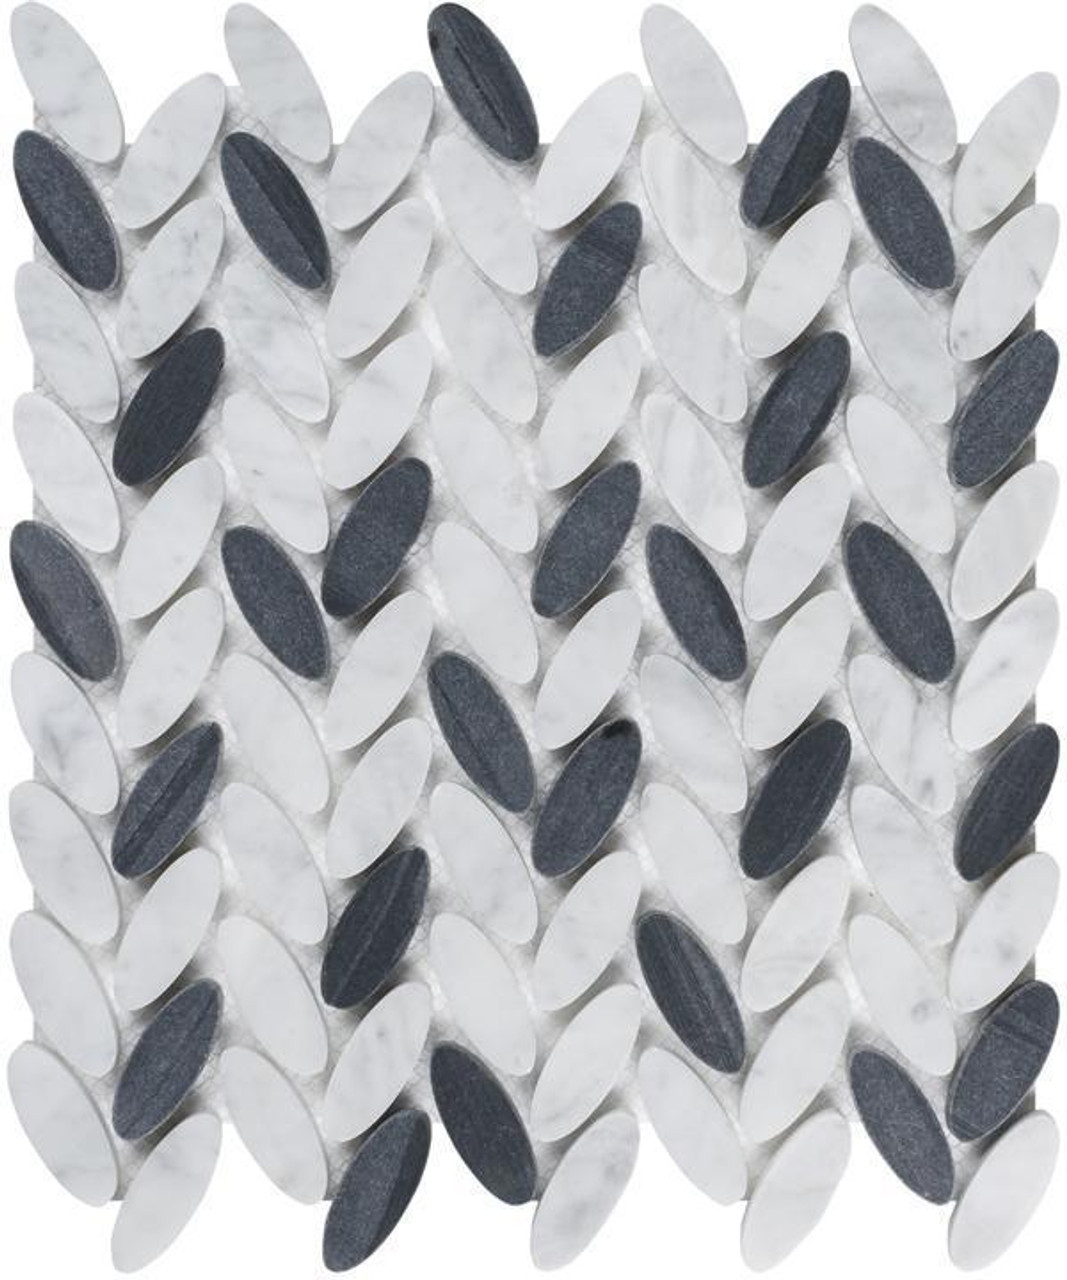 UBC Elyptic Herringbone Tile Black n White